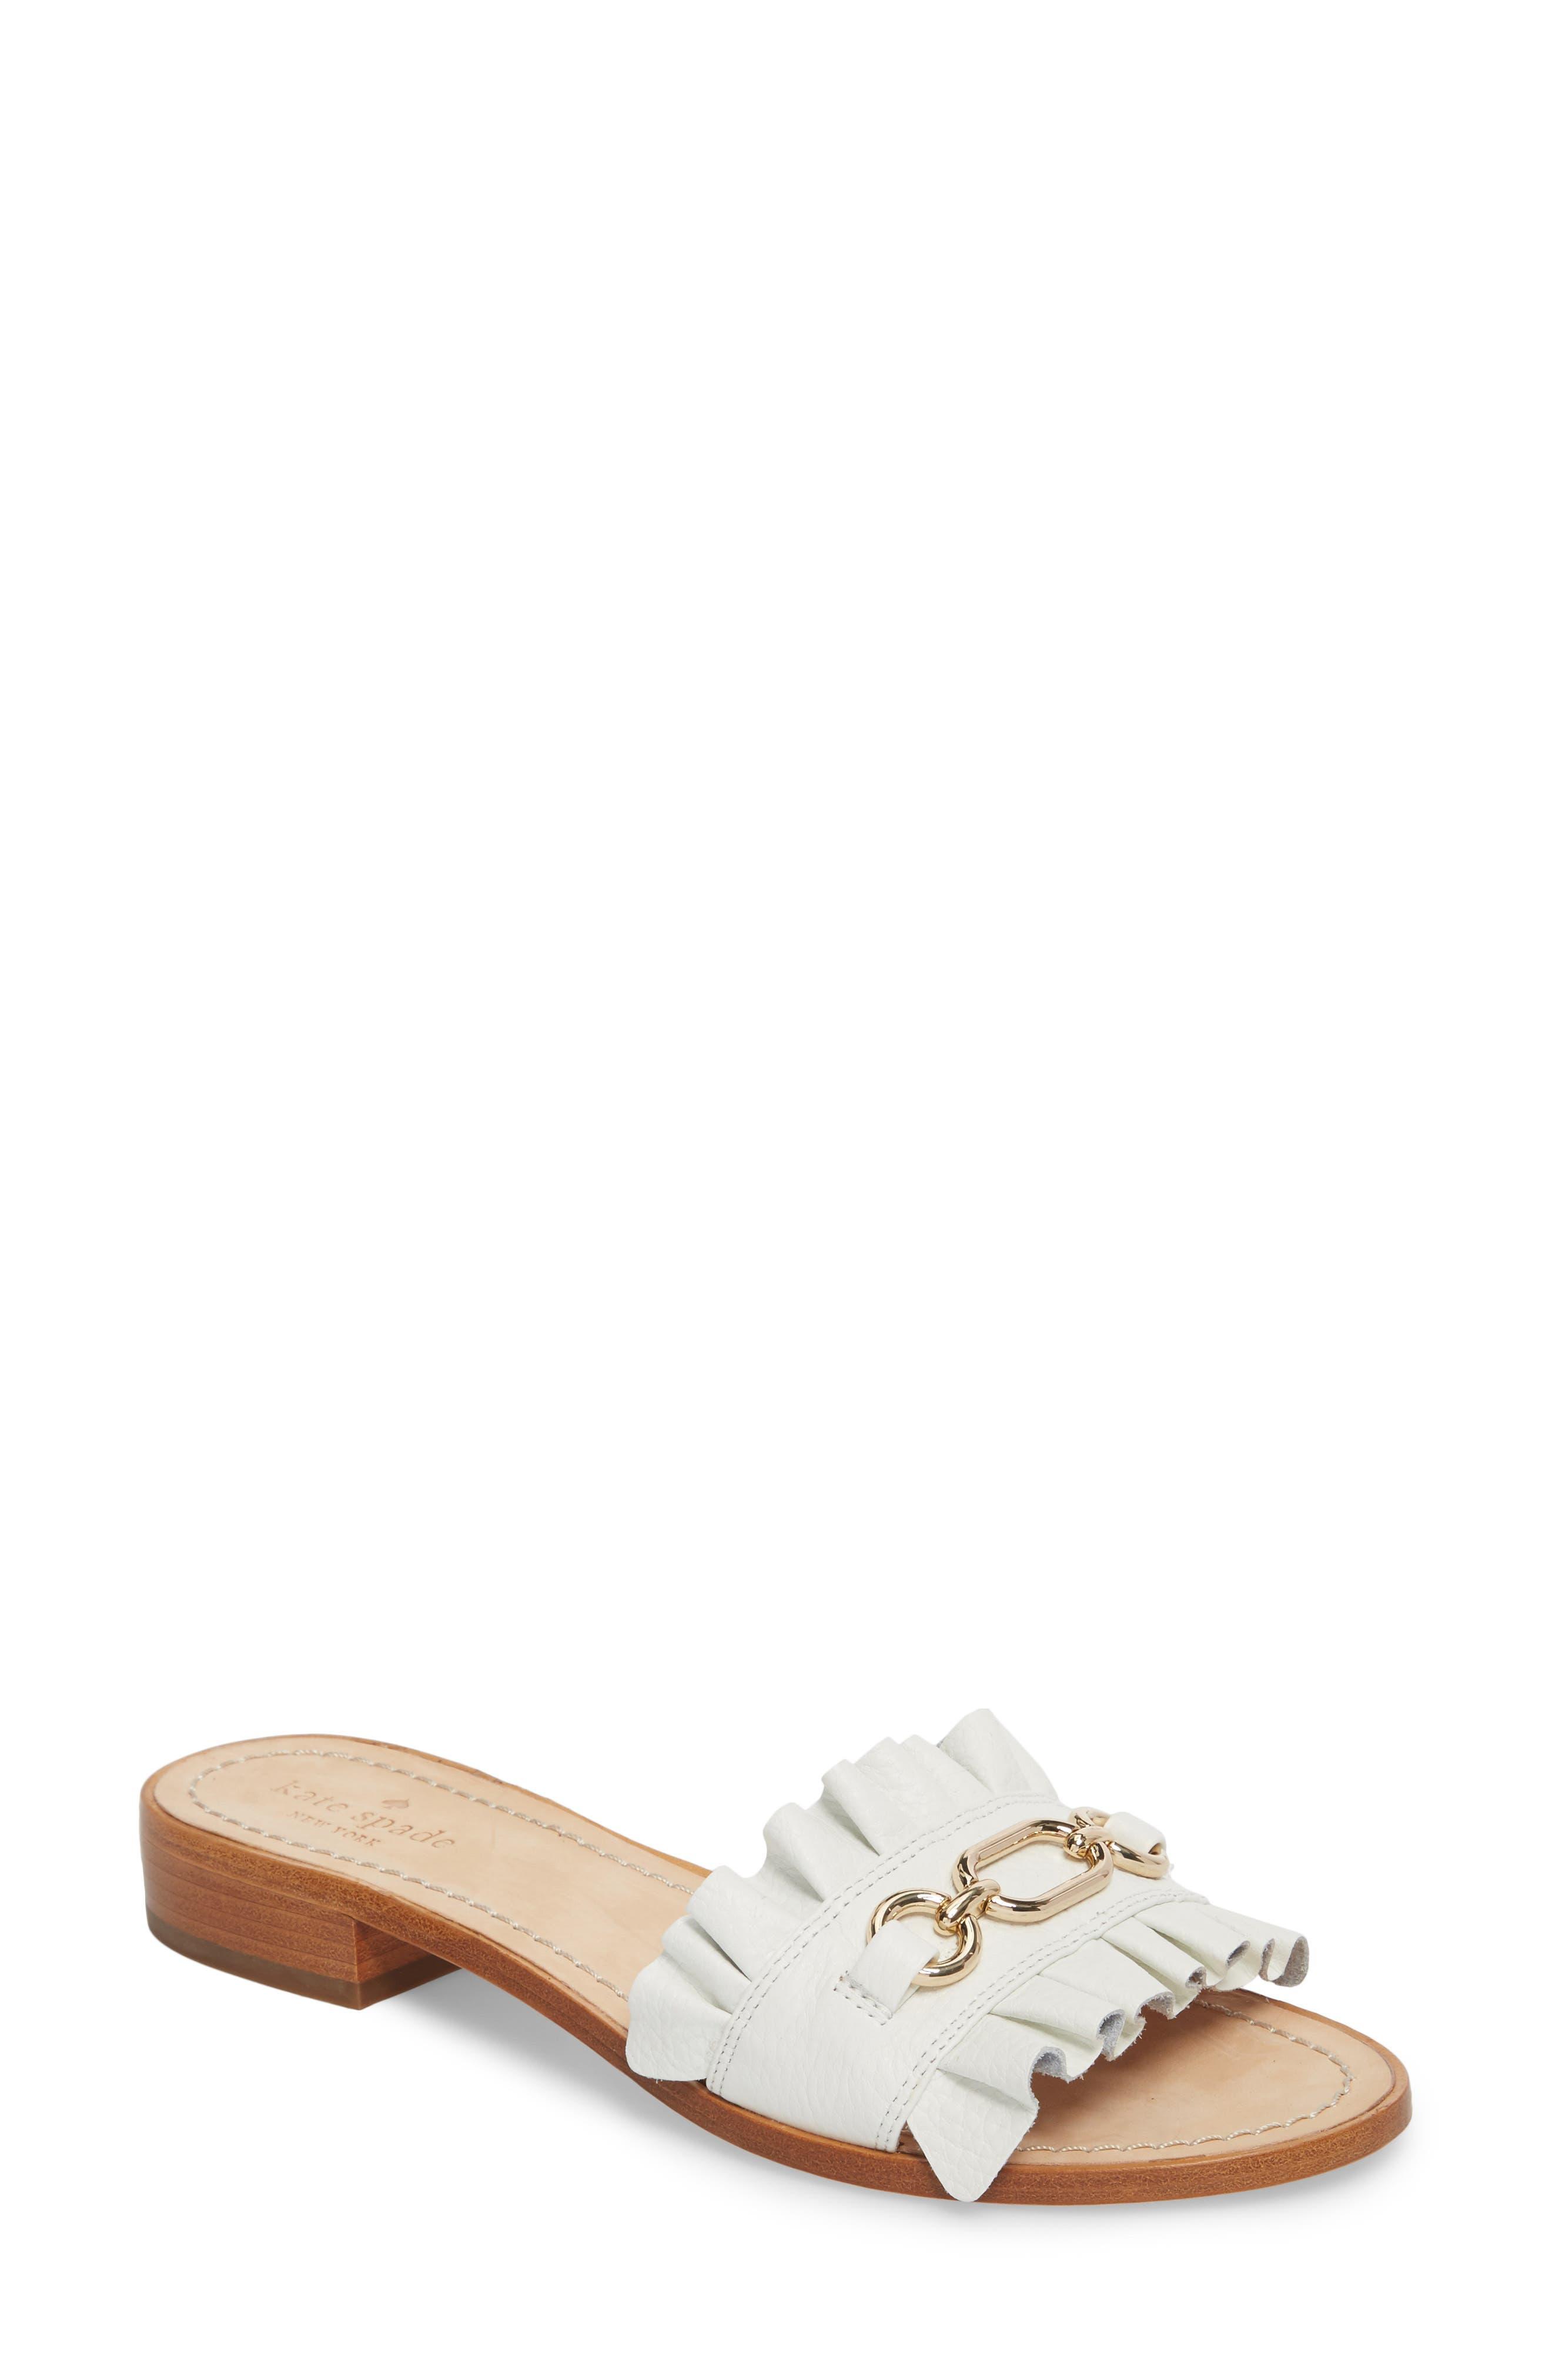 Main Image - kate spade new york beau slide sandal (Women)